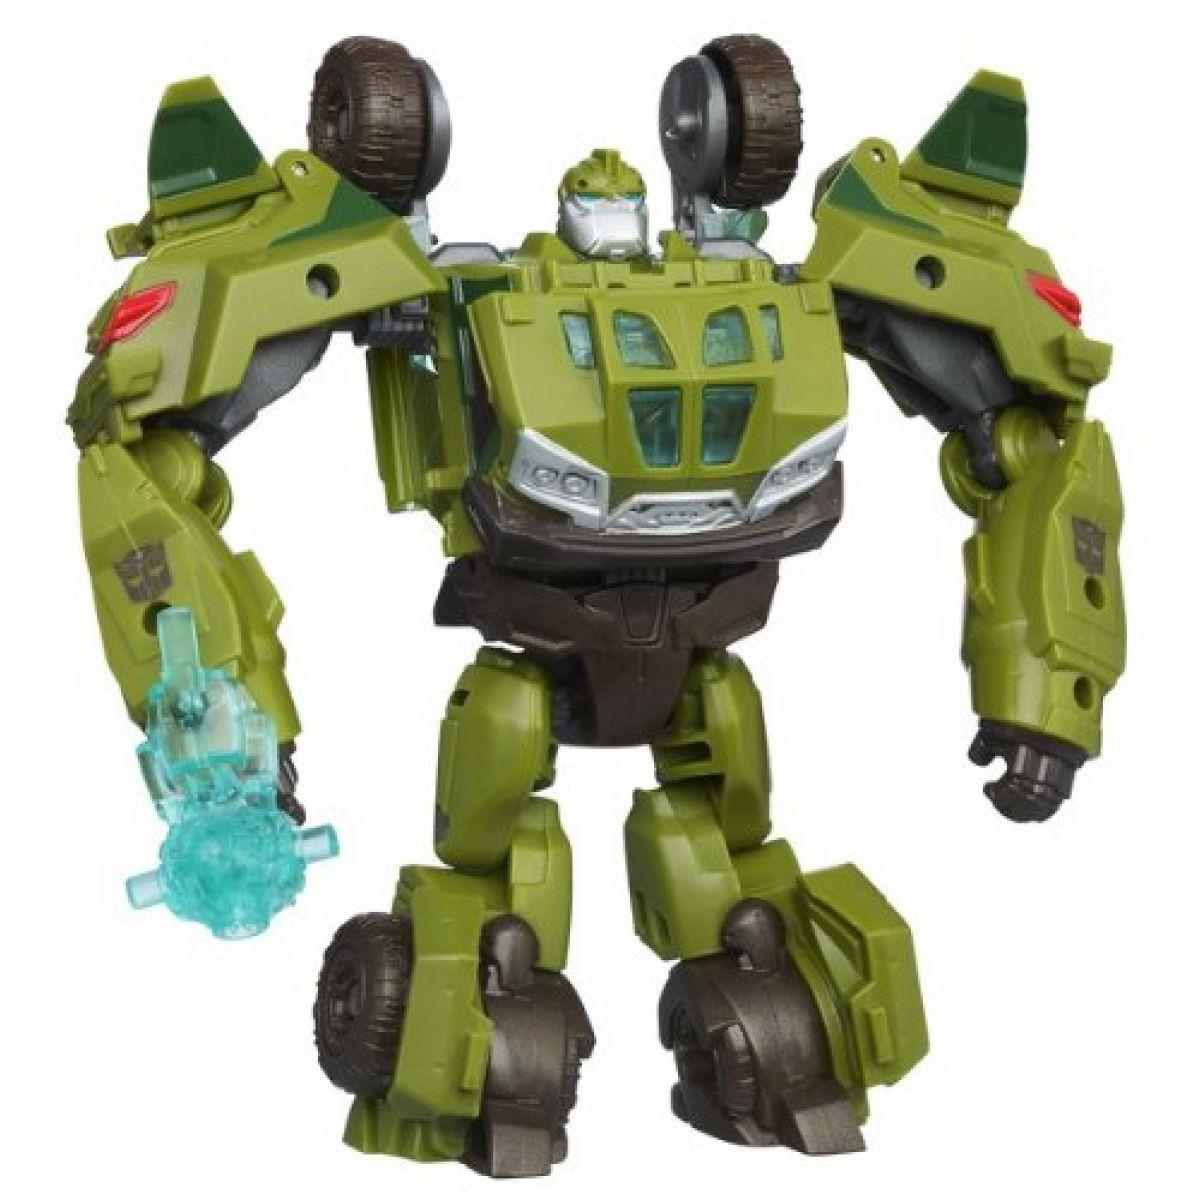 Transformers Cyberverse Commander Hasbro - Bulkhead